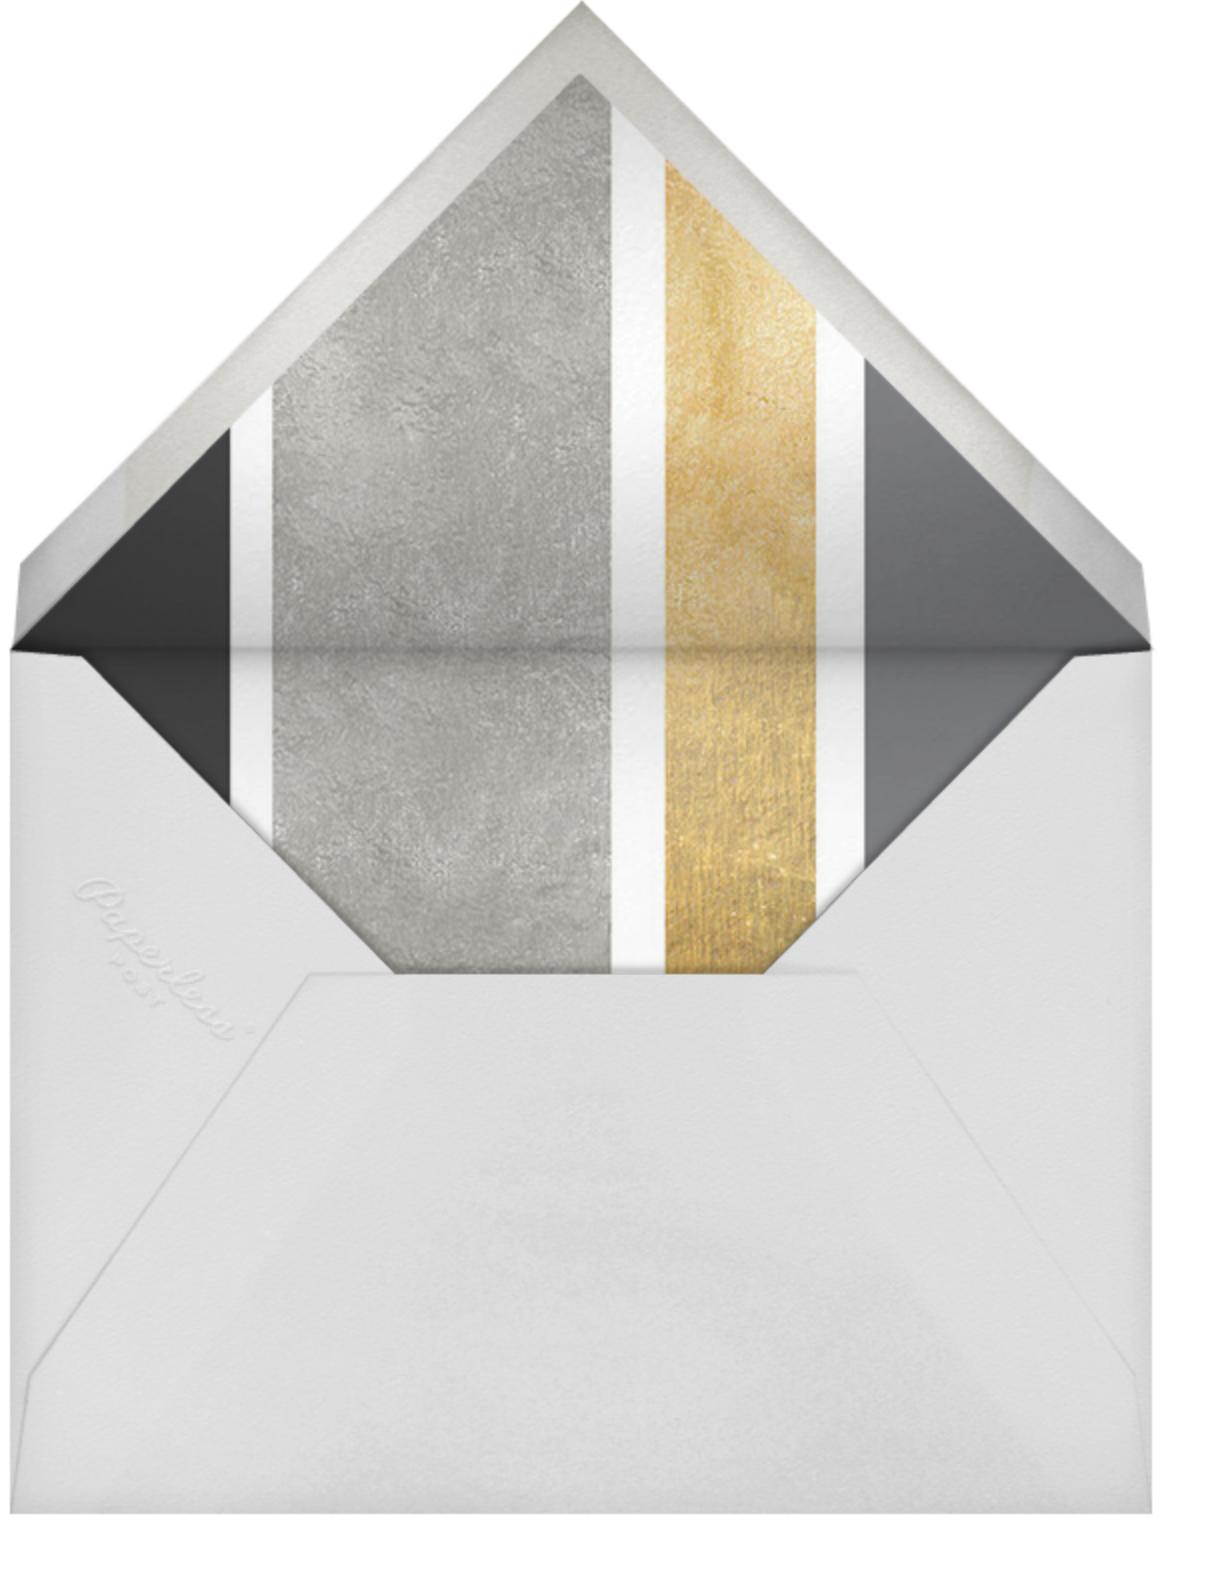 Just My Type - Metallic - Cheree Berry Paper & Design - Envelope